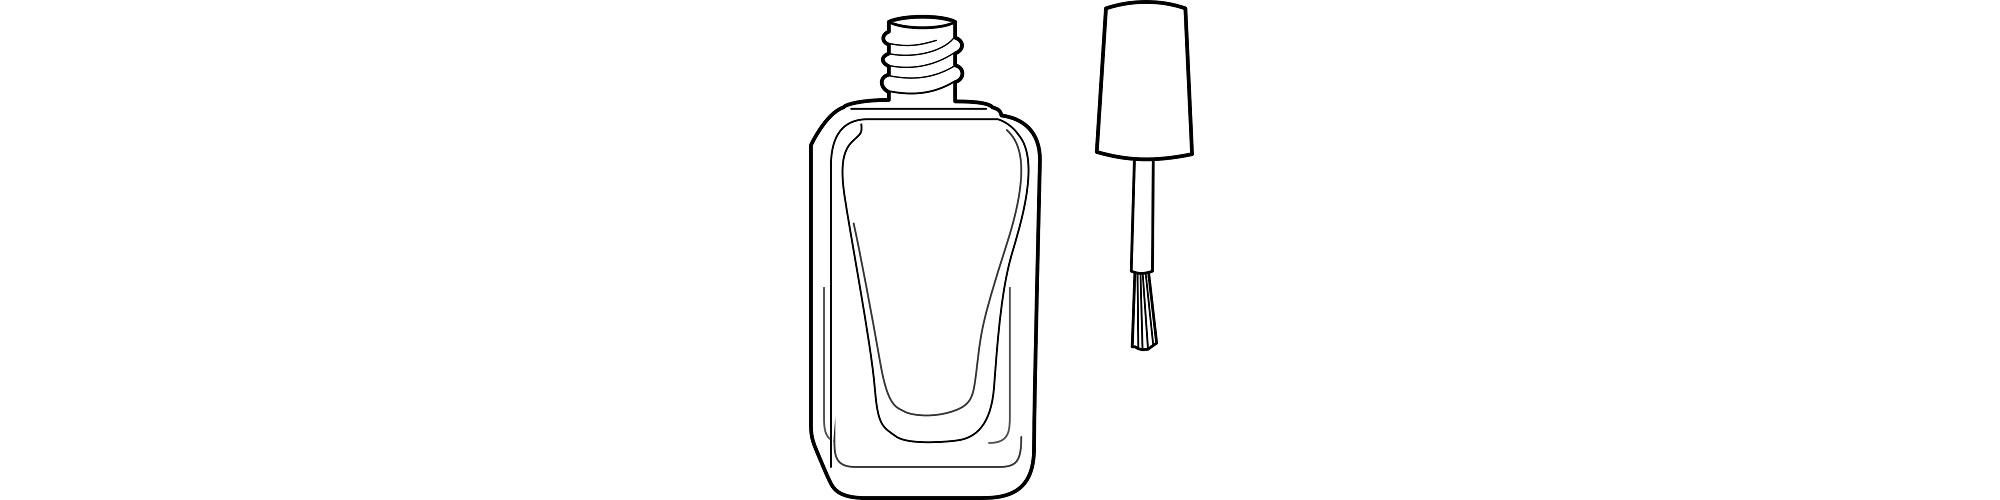 "Nail polish bottle illustration - ""The Nail Reader"" microfiction"